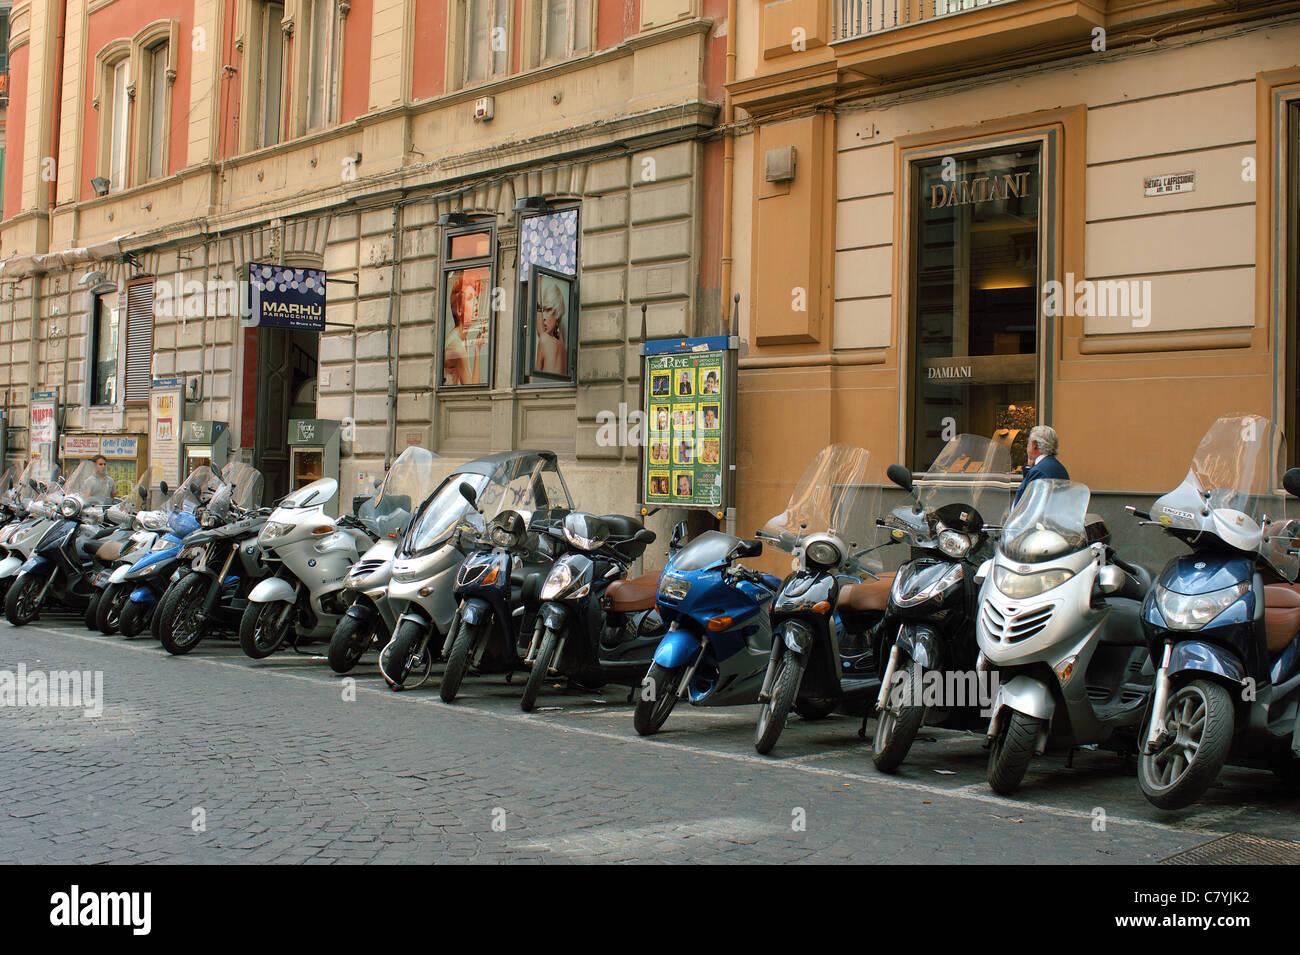 Motor Bikes Scooters Naples Napoli Italy Stock Photo